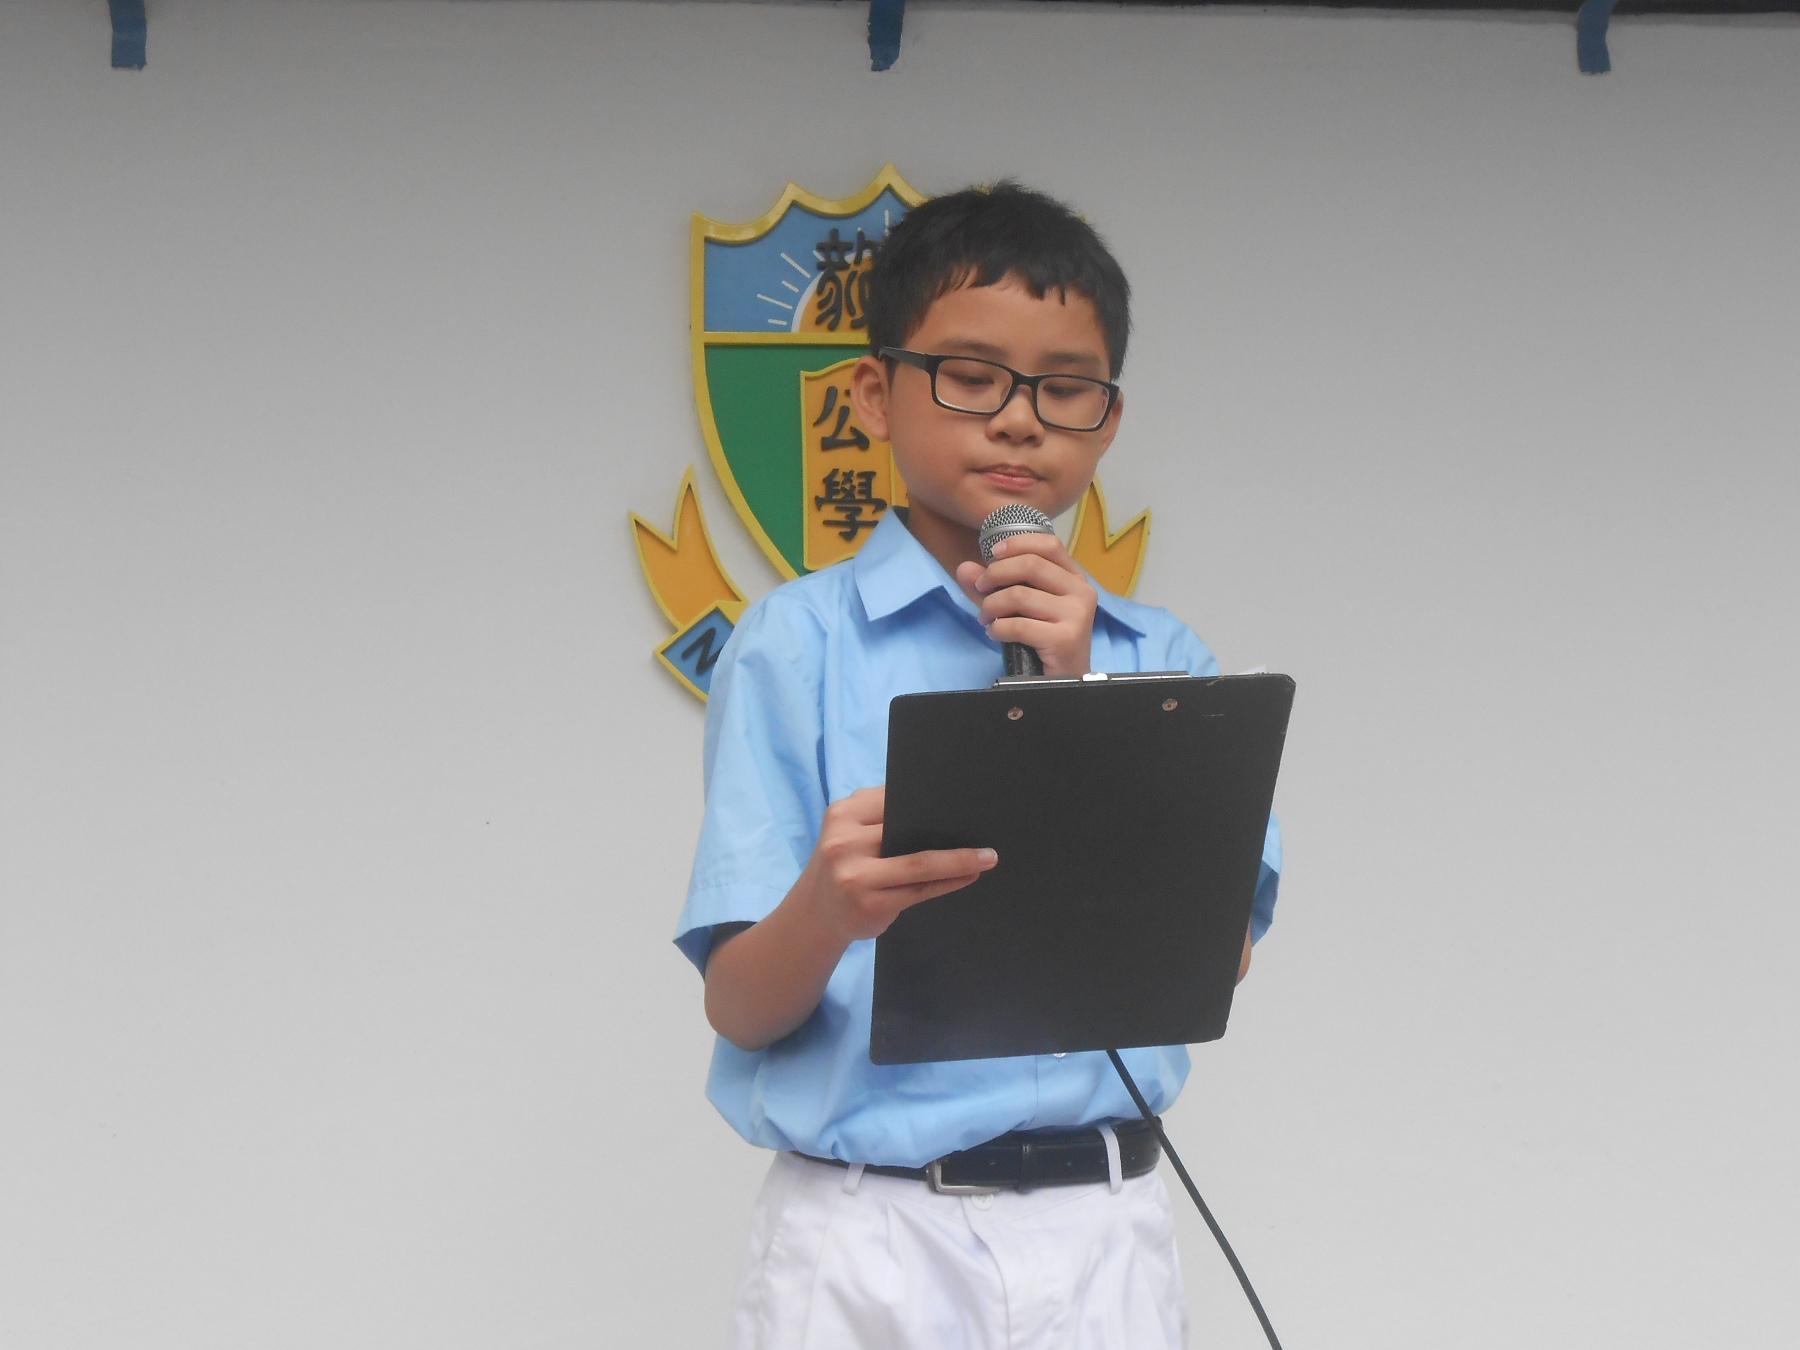 http://npc.edu.hk/sites/default/files/dscn9656.jpg